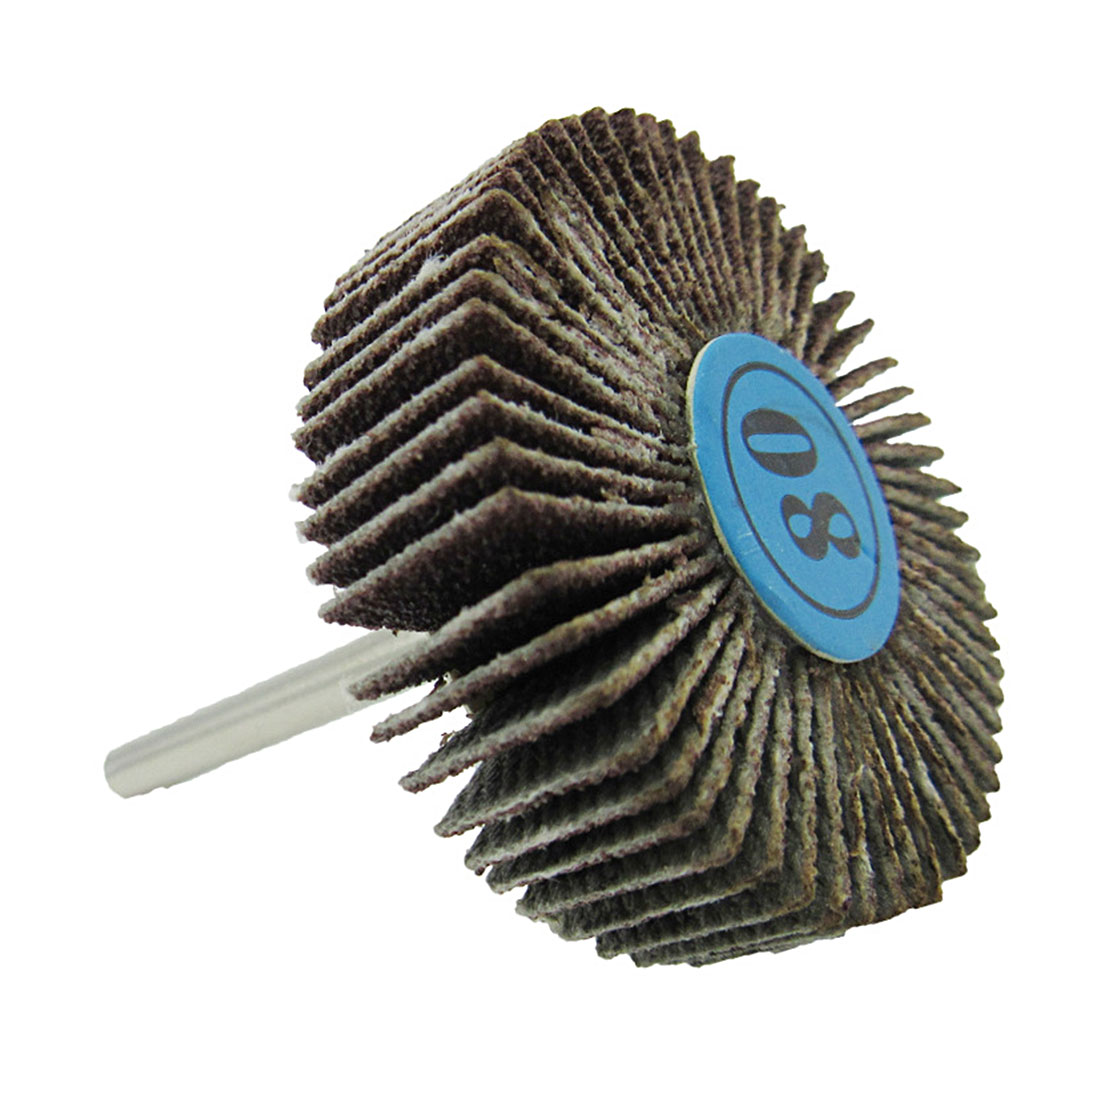 Rotary Power Tools 5Pcs Dremel Accessories Sandpaper Sanding Flap Polishing Wheels Sanding Disc Set Shutter Polishing Wheel